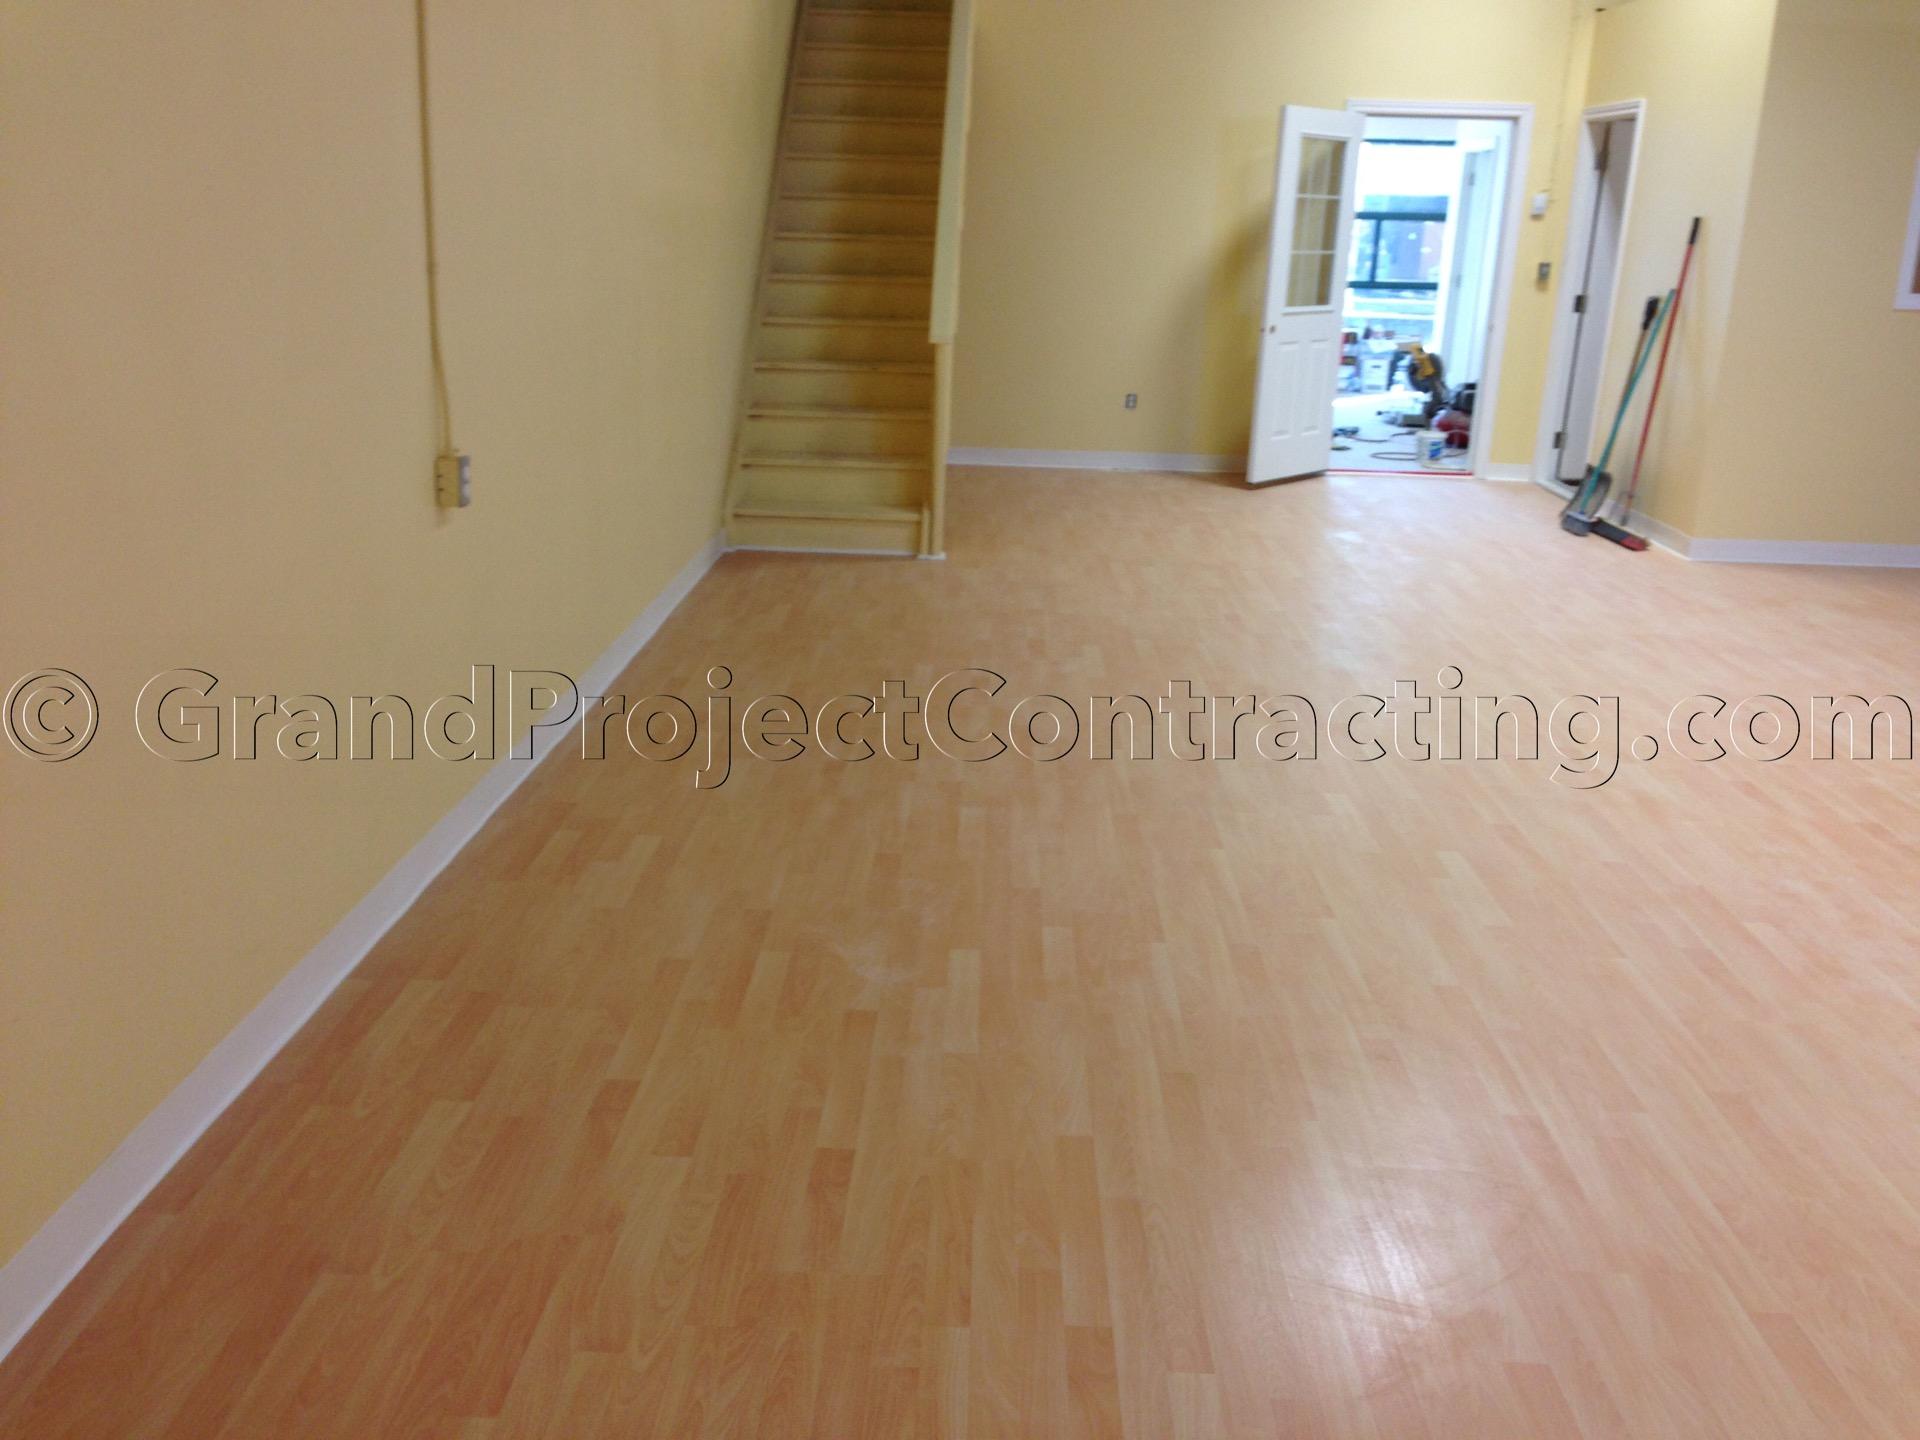 Commercial Laminate Floor Installation Hardwood Floors Milton